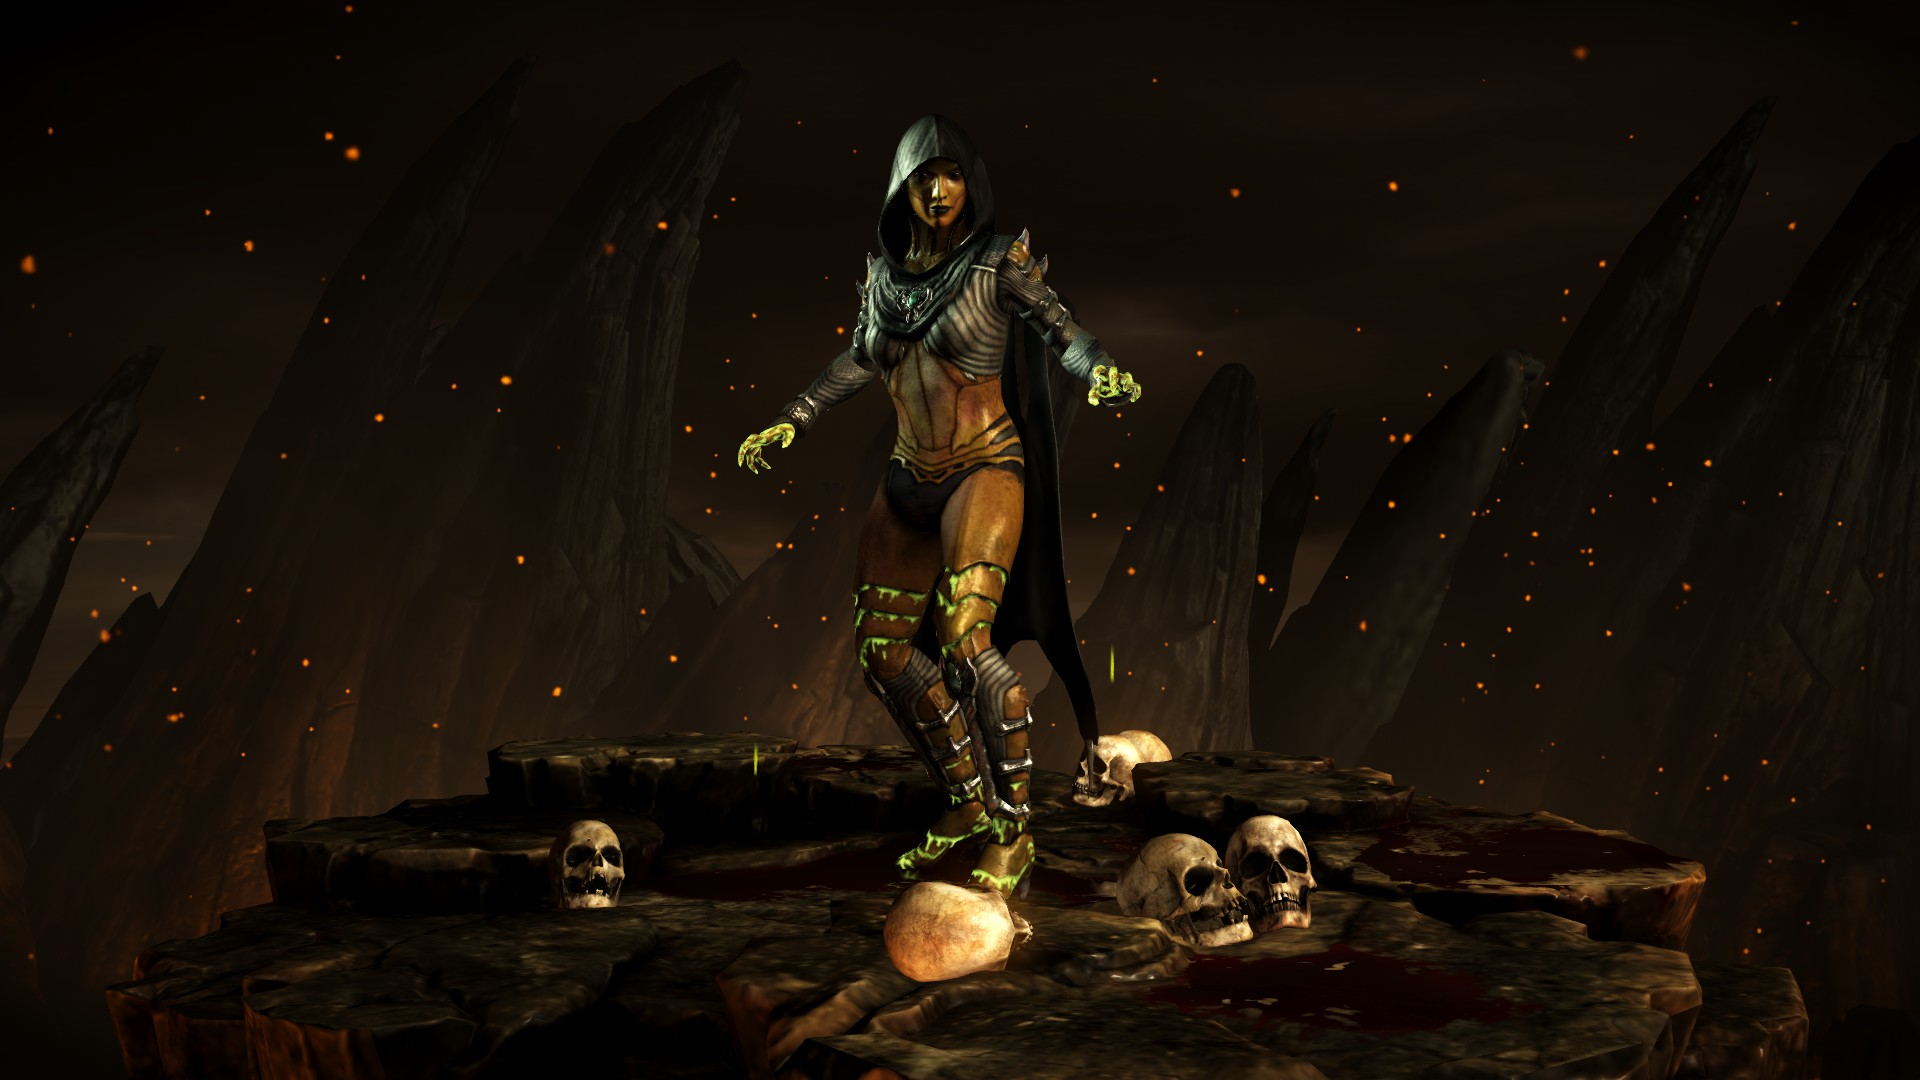 Ди'Вора (Стиль: Отрава) - Mortal Kombat X Ди'Вора